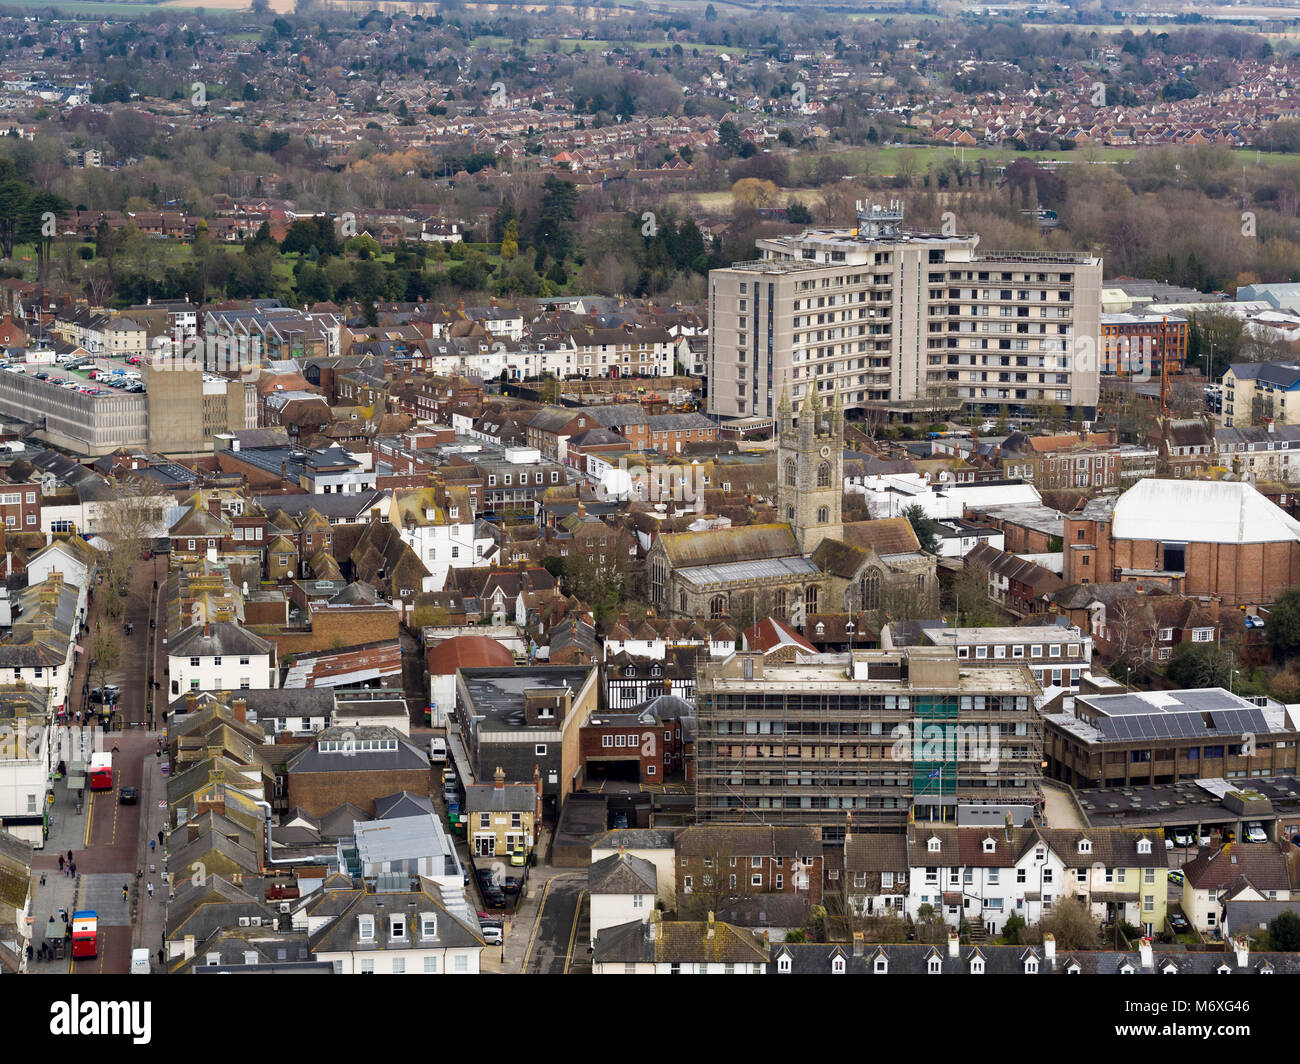 Aerial view of Ashford, Kent, UK - Stock Image